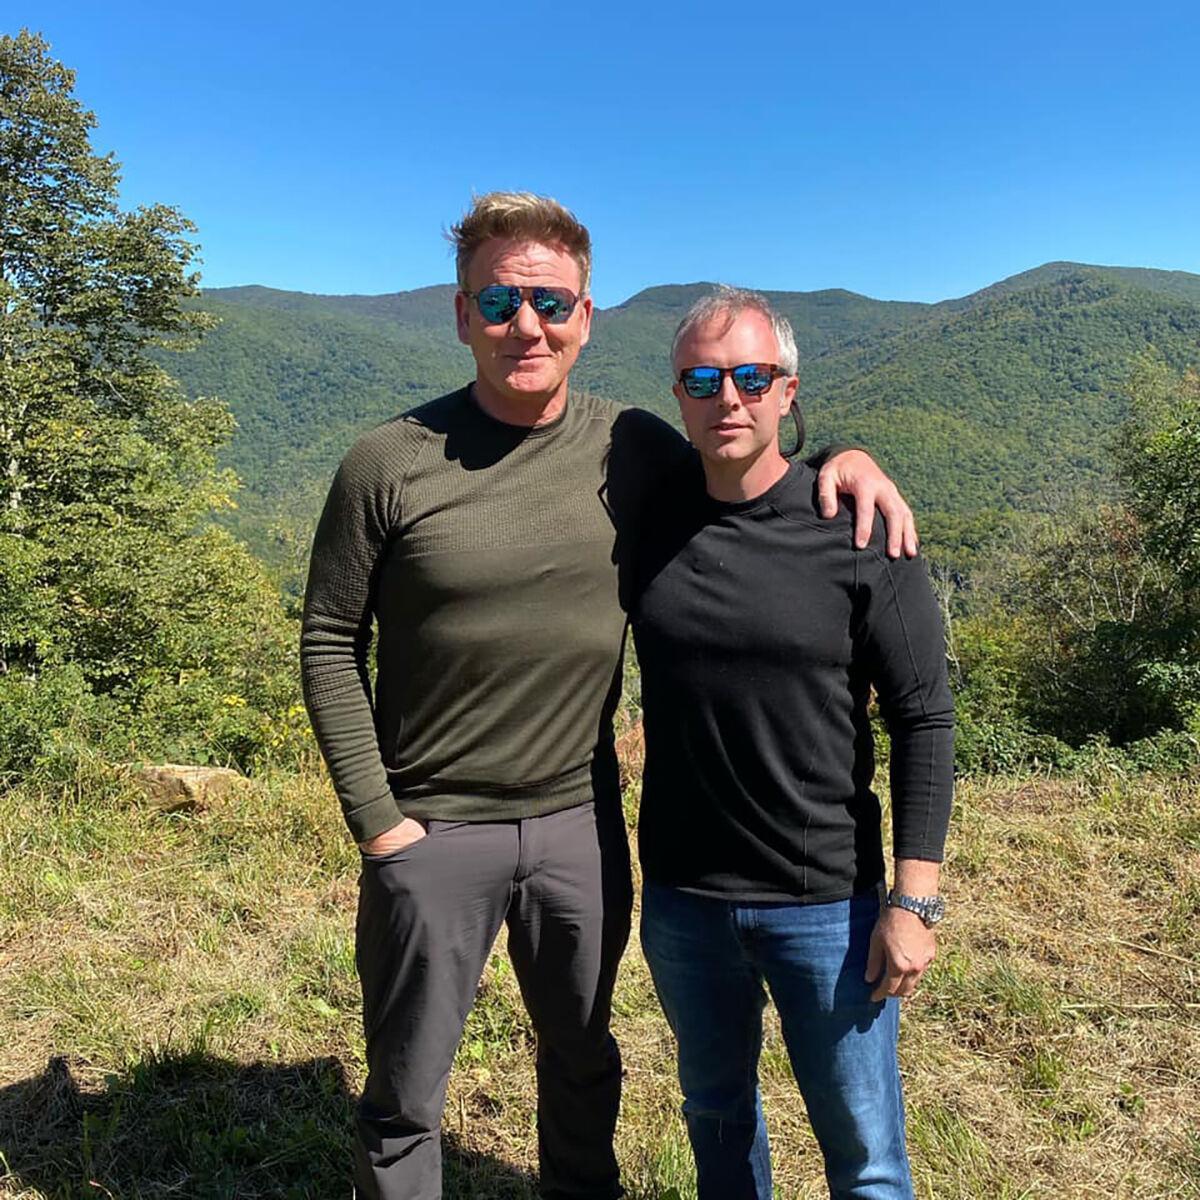 Gordon Ramsay & William Dissen - Balsam Mtn Preserve